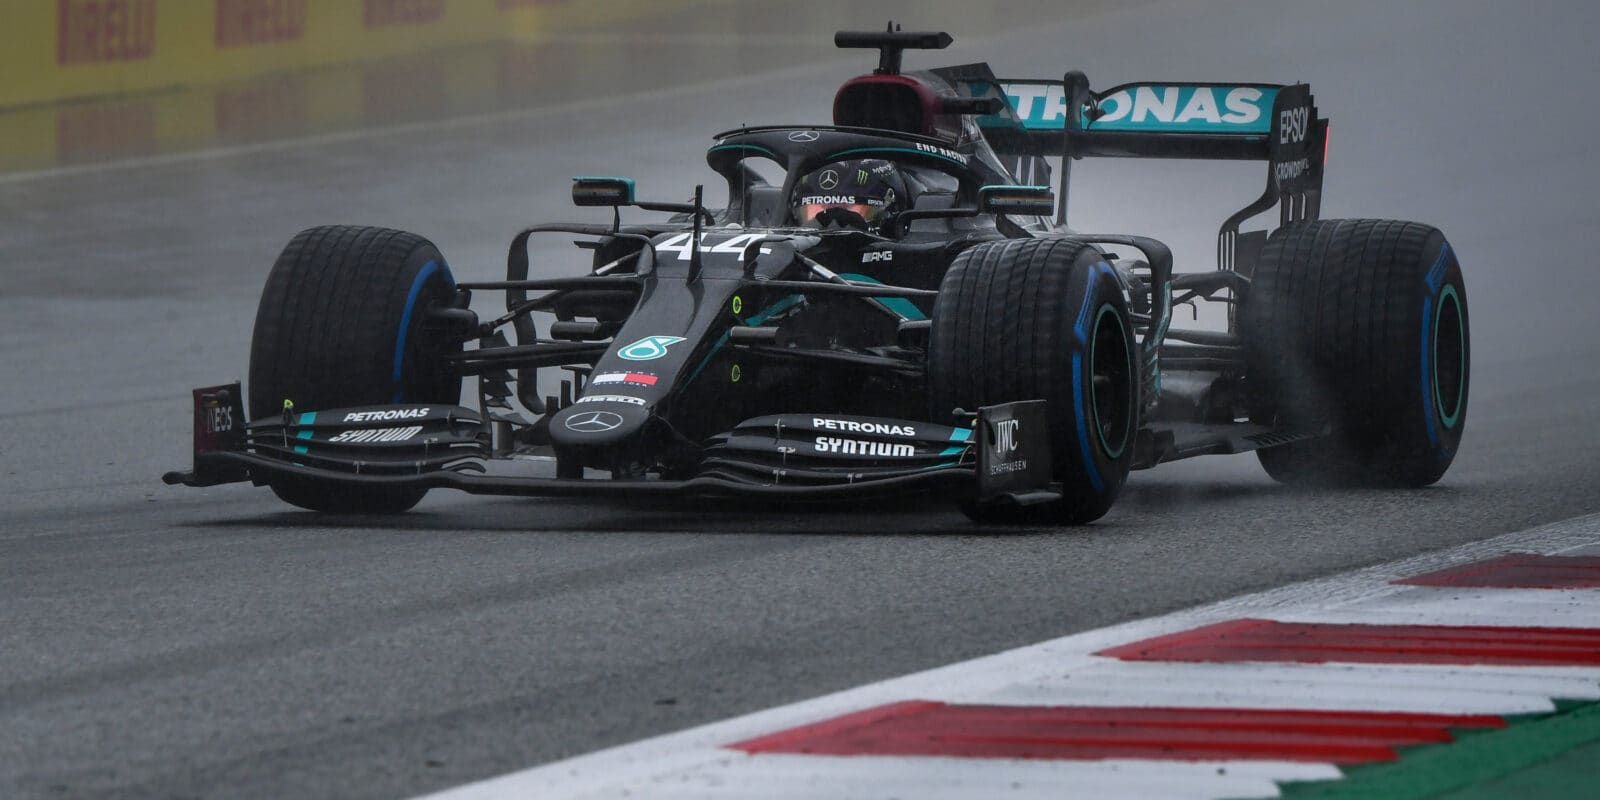 Odloženou kvalifikaci vyhrál o sekundu Lewis Hamilton